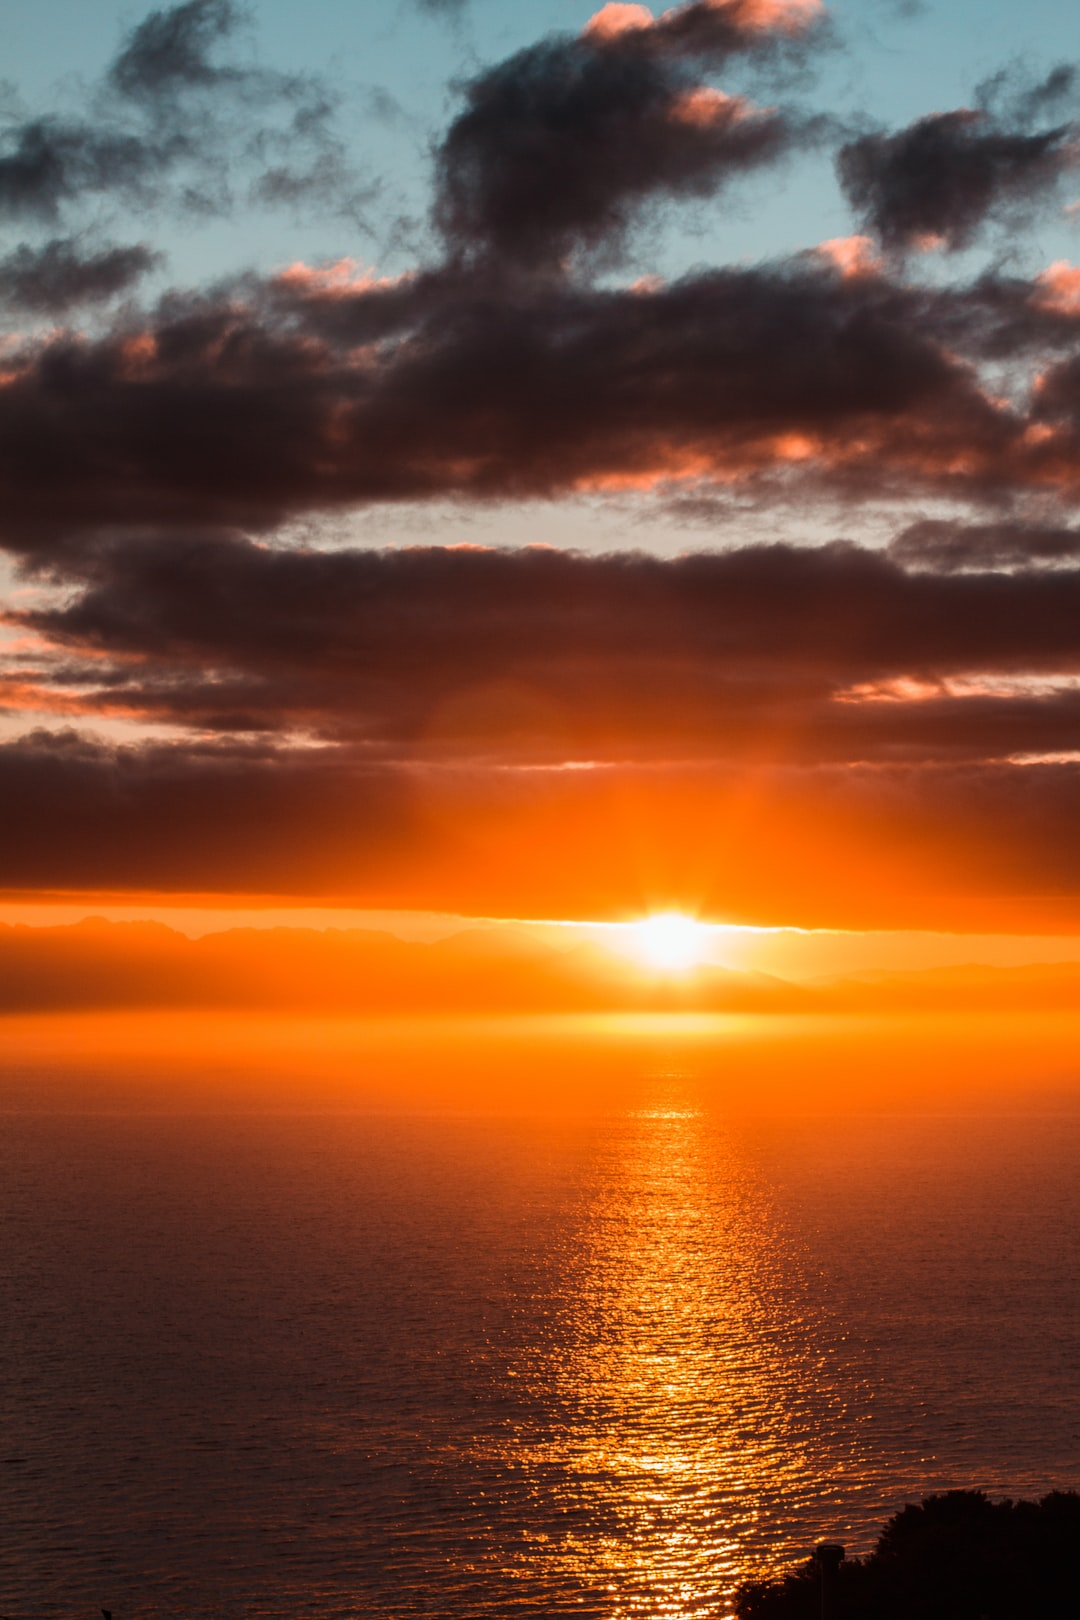 Bright Sunrise over the ocean